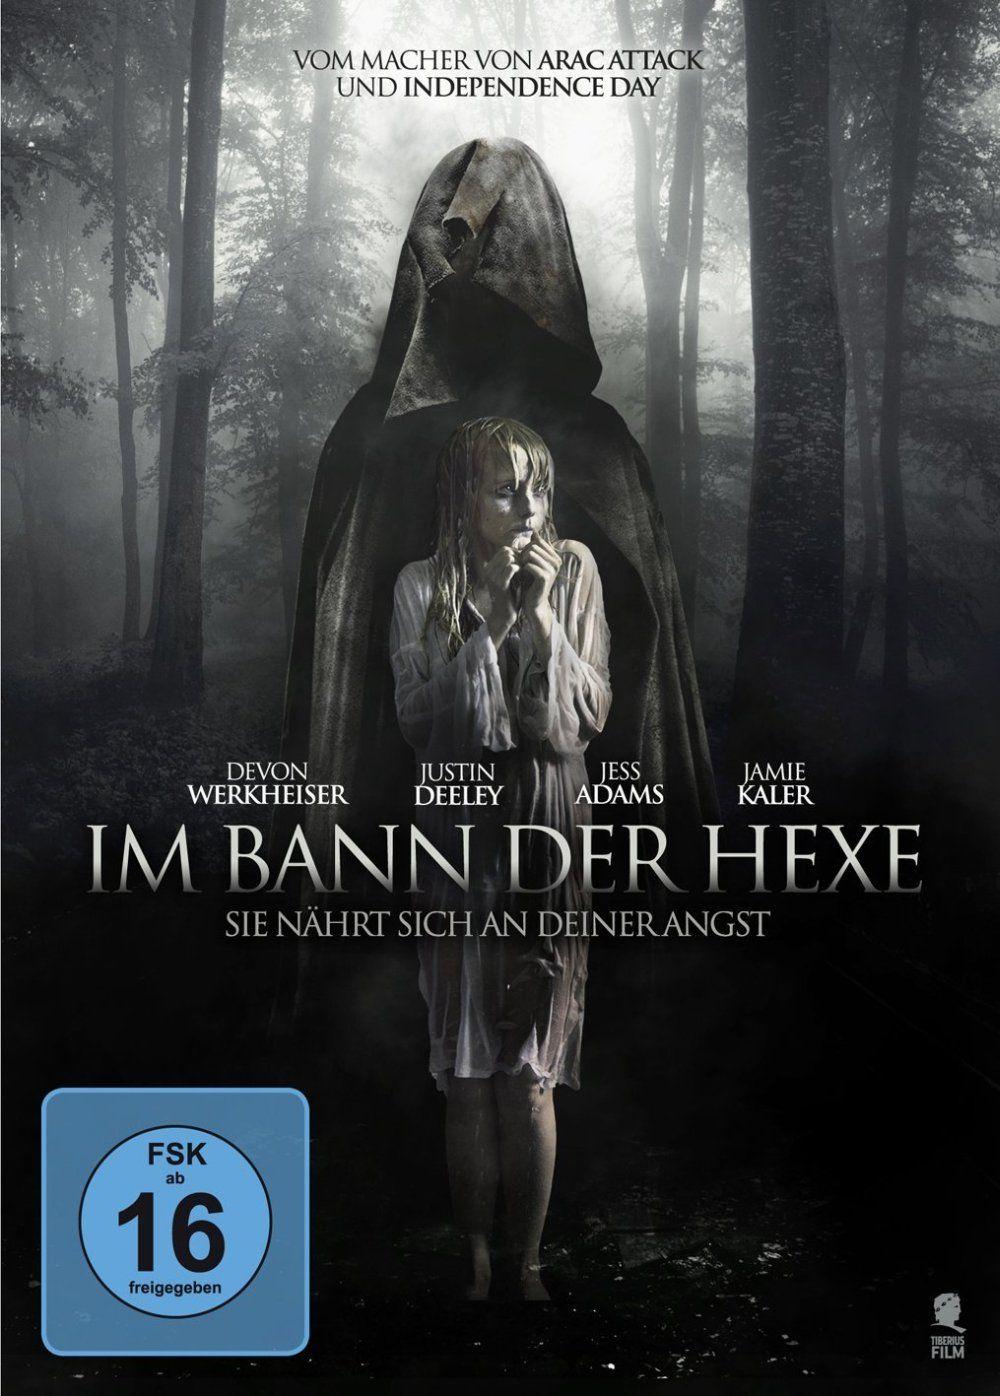 Im Bann Der Hexe Dvd Cover Fsk 16 Jpg 1000 1396 Dvd Scary Movies Horror Movies